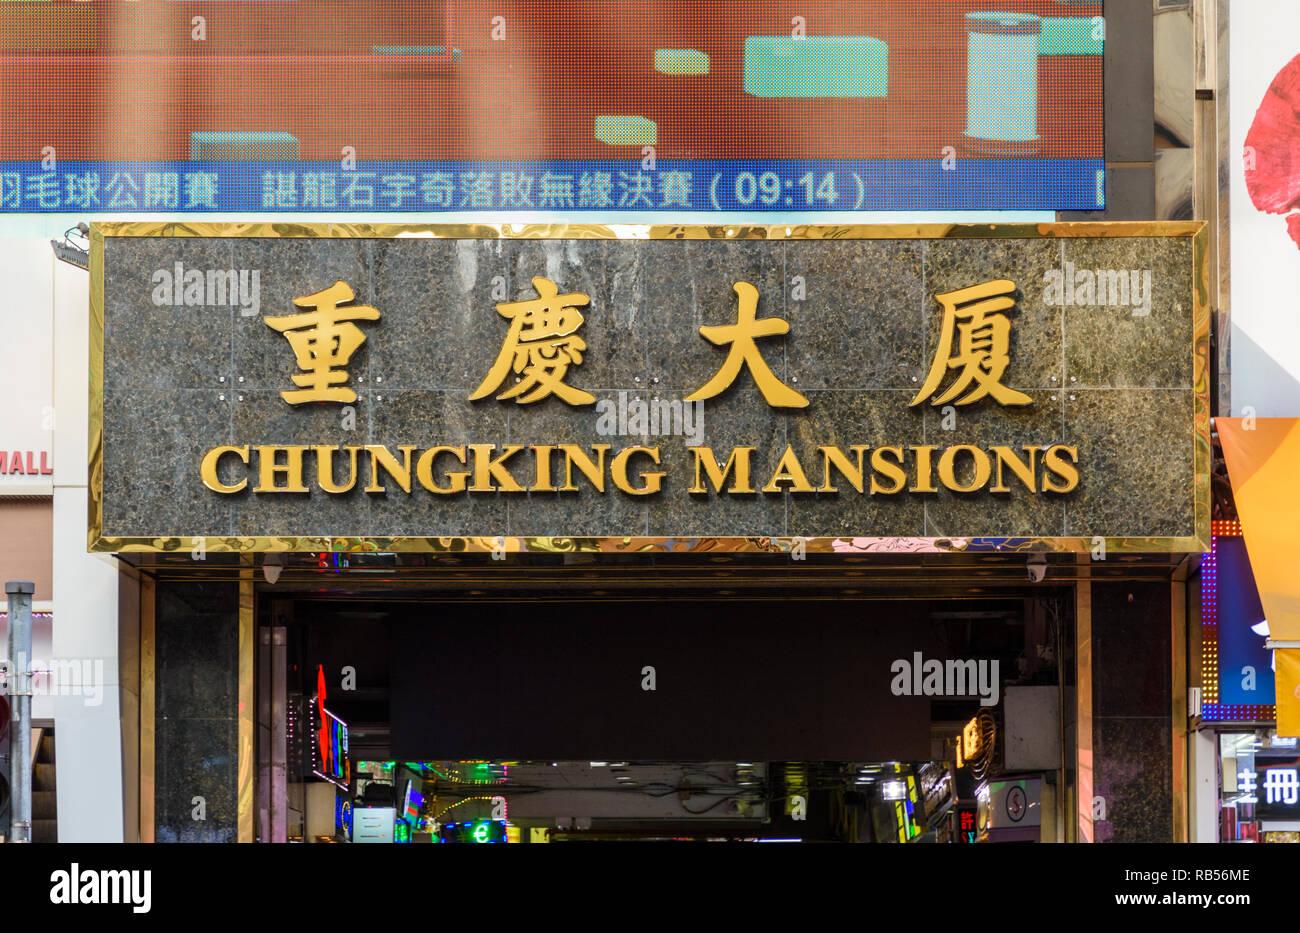 Chungking mansiones firmar sobre la fachada de la entrada de la calle Nathan Rd, Tsim Sha Tsui, Kowloon, Hong Kong Foto de stock